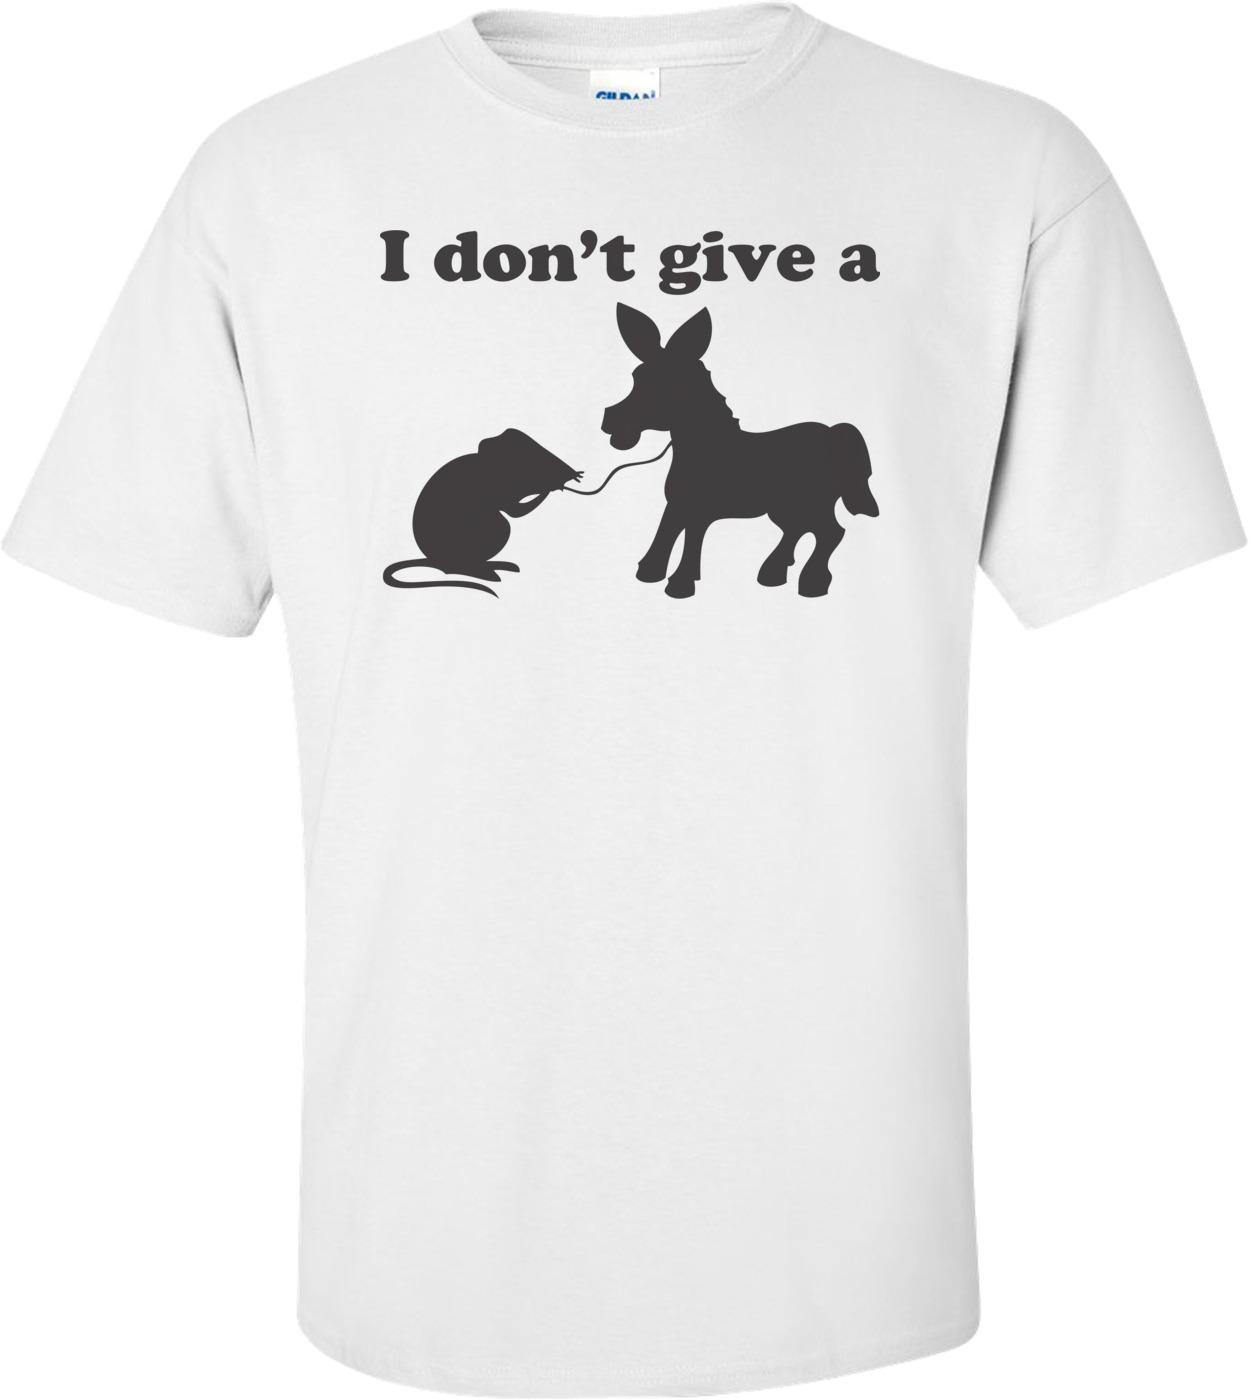 I Don't Give A Rats Ass Shirt